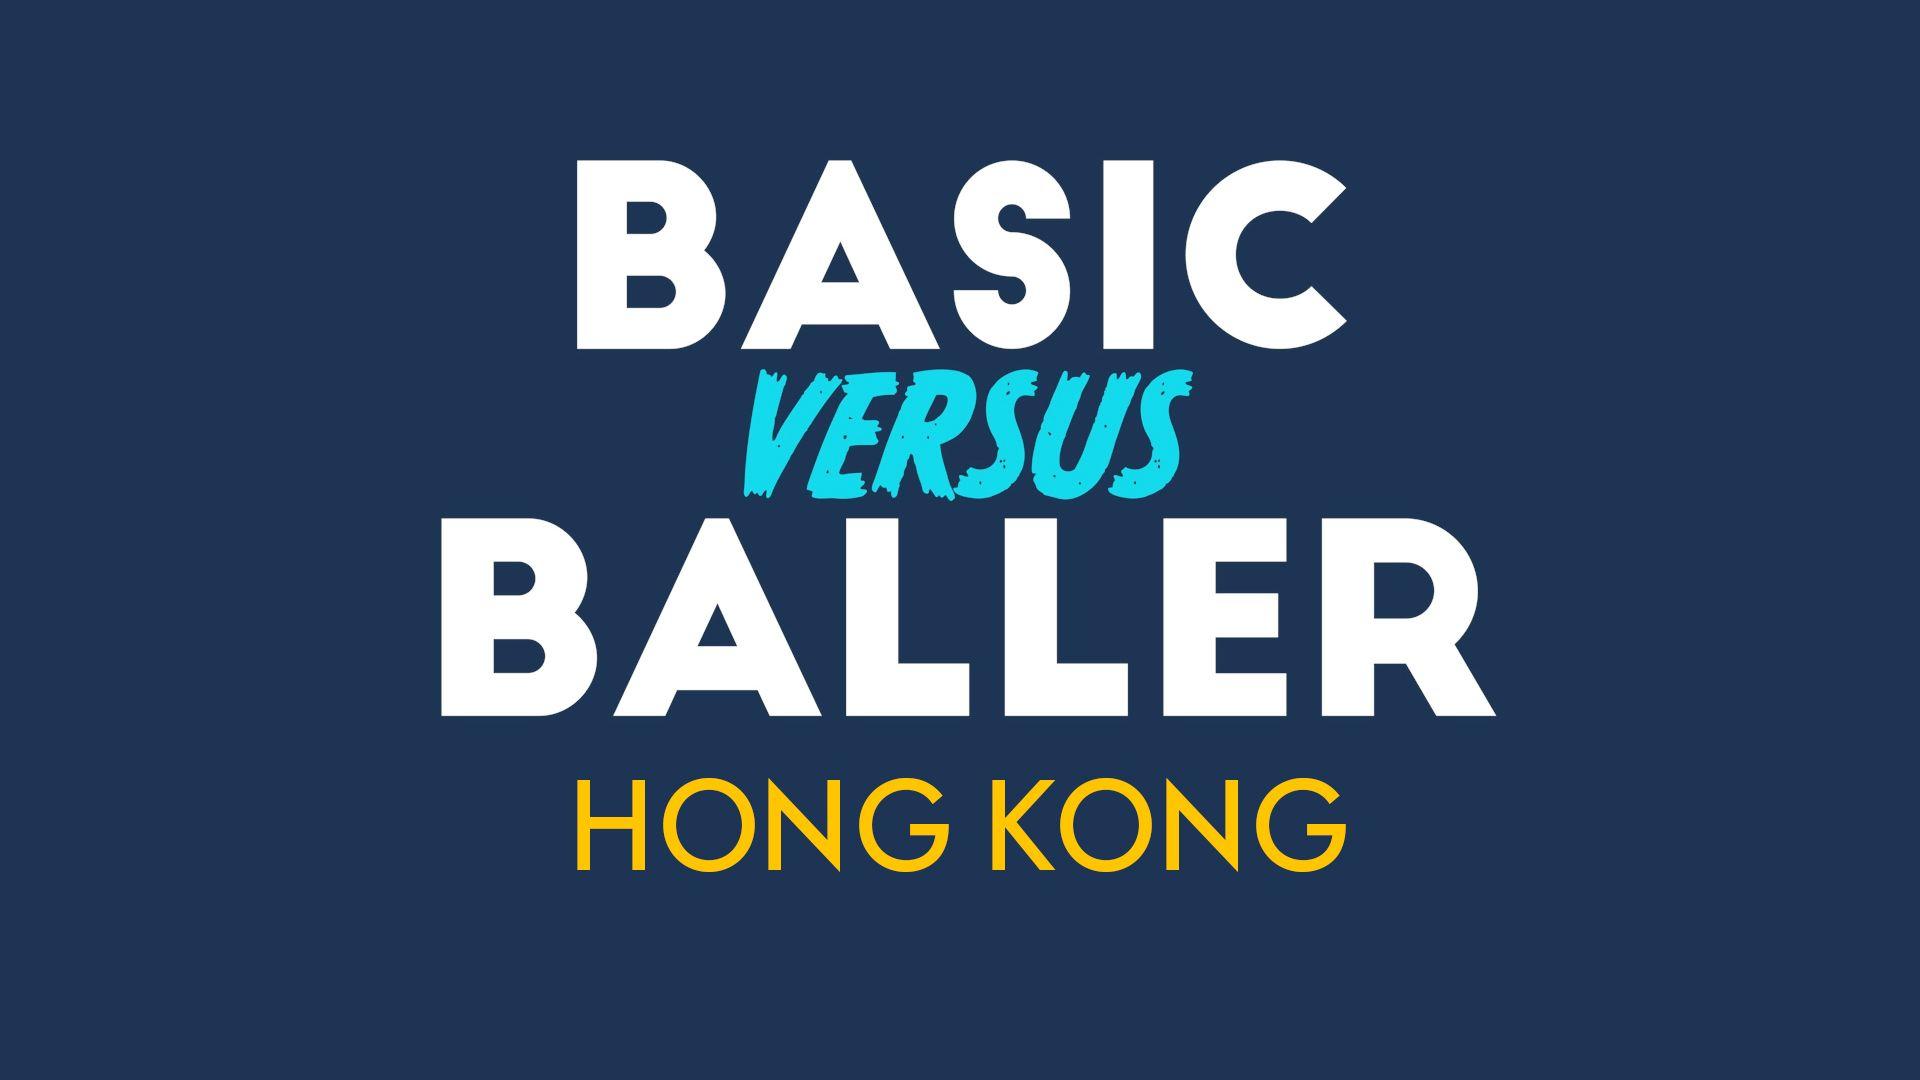 BASIC VERSUS BALLER - EPISODE 1 - HONG KONG